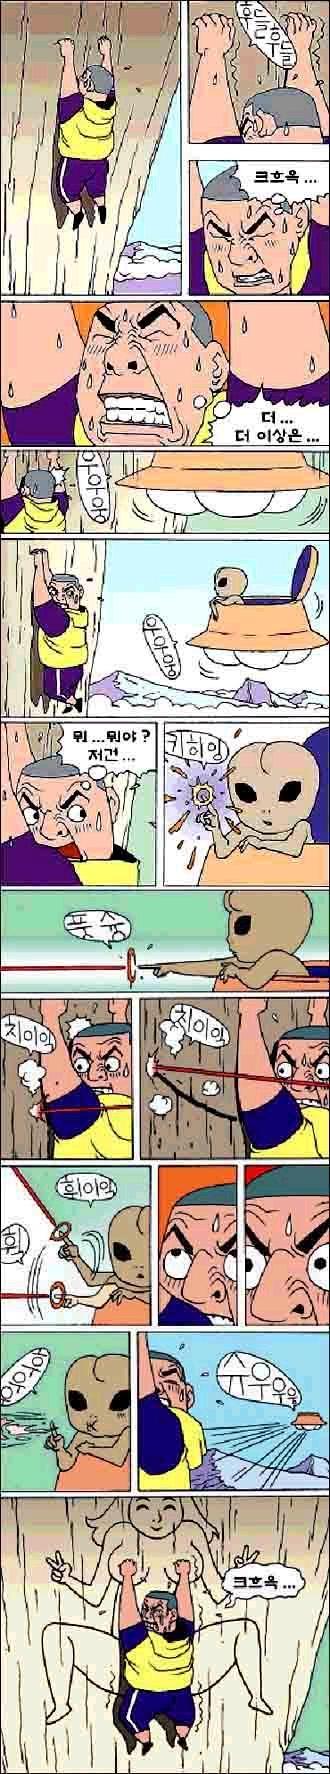 ufo11.jpg